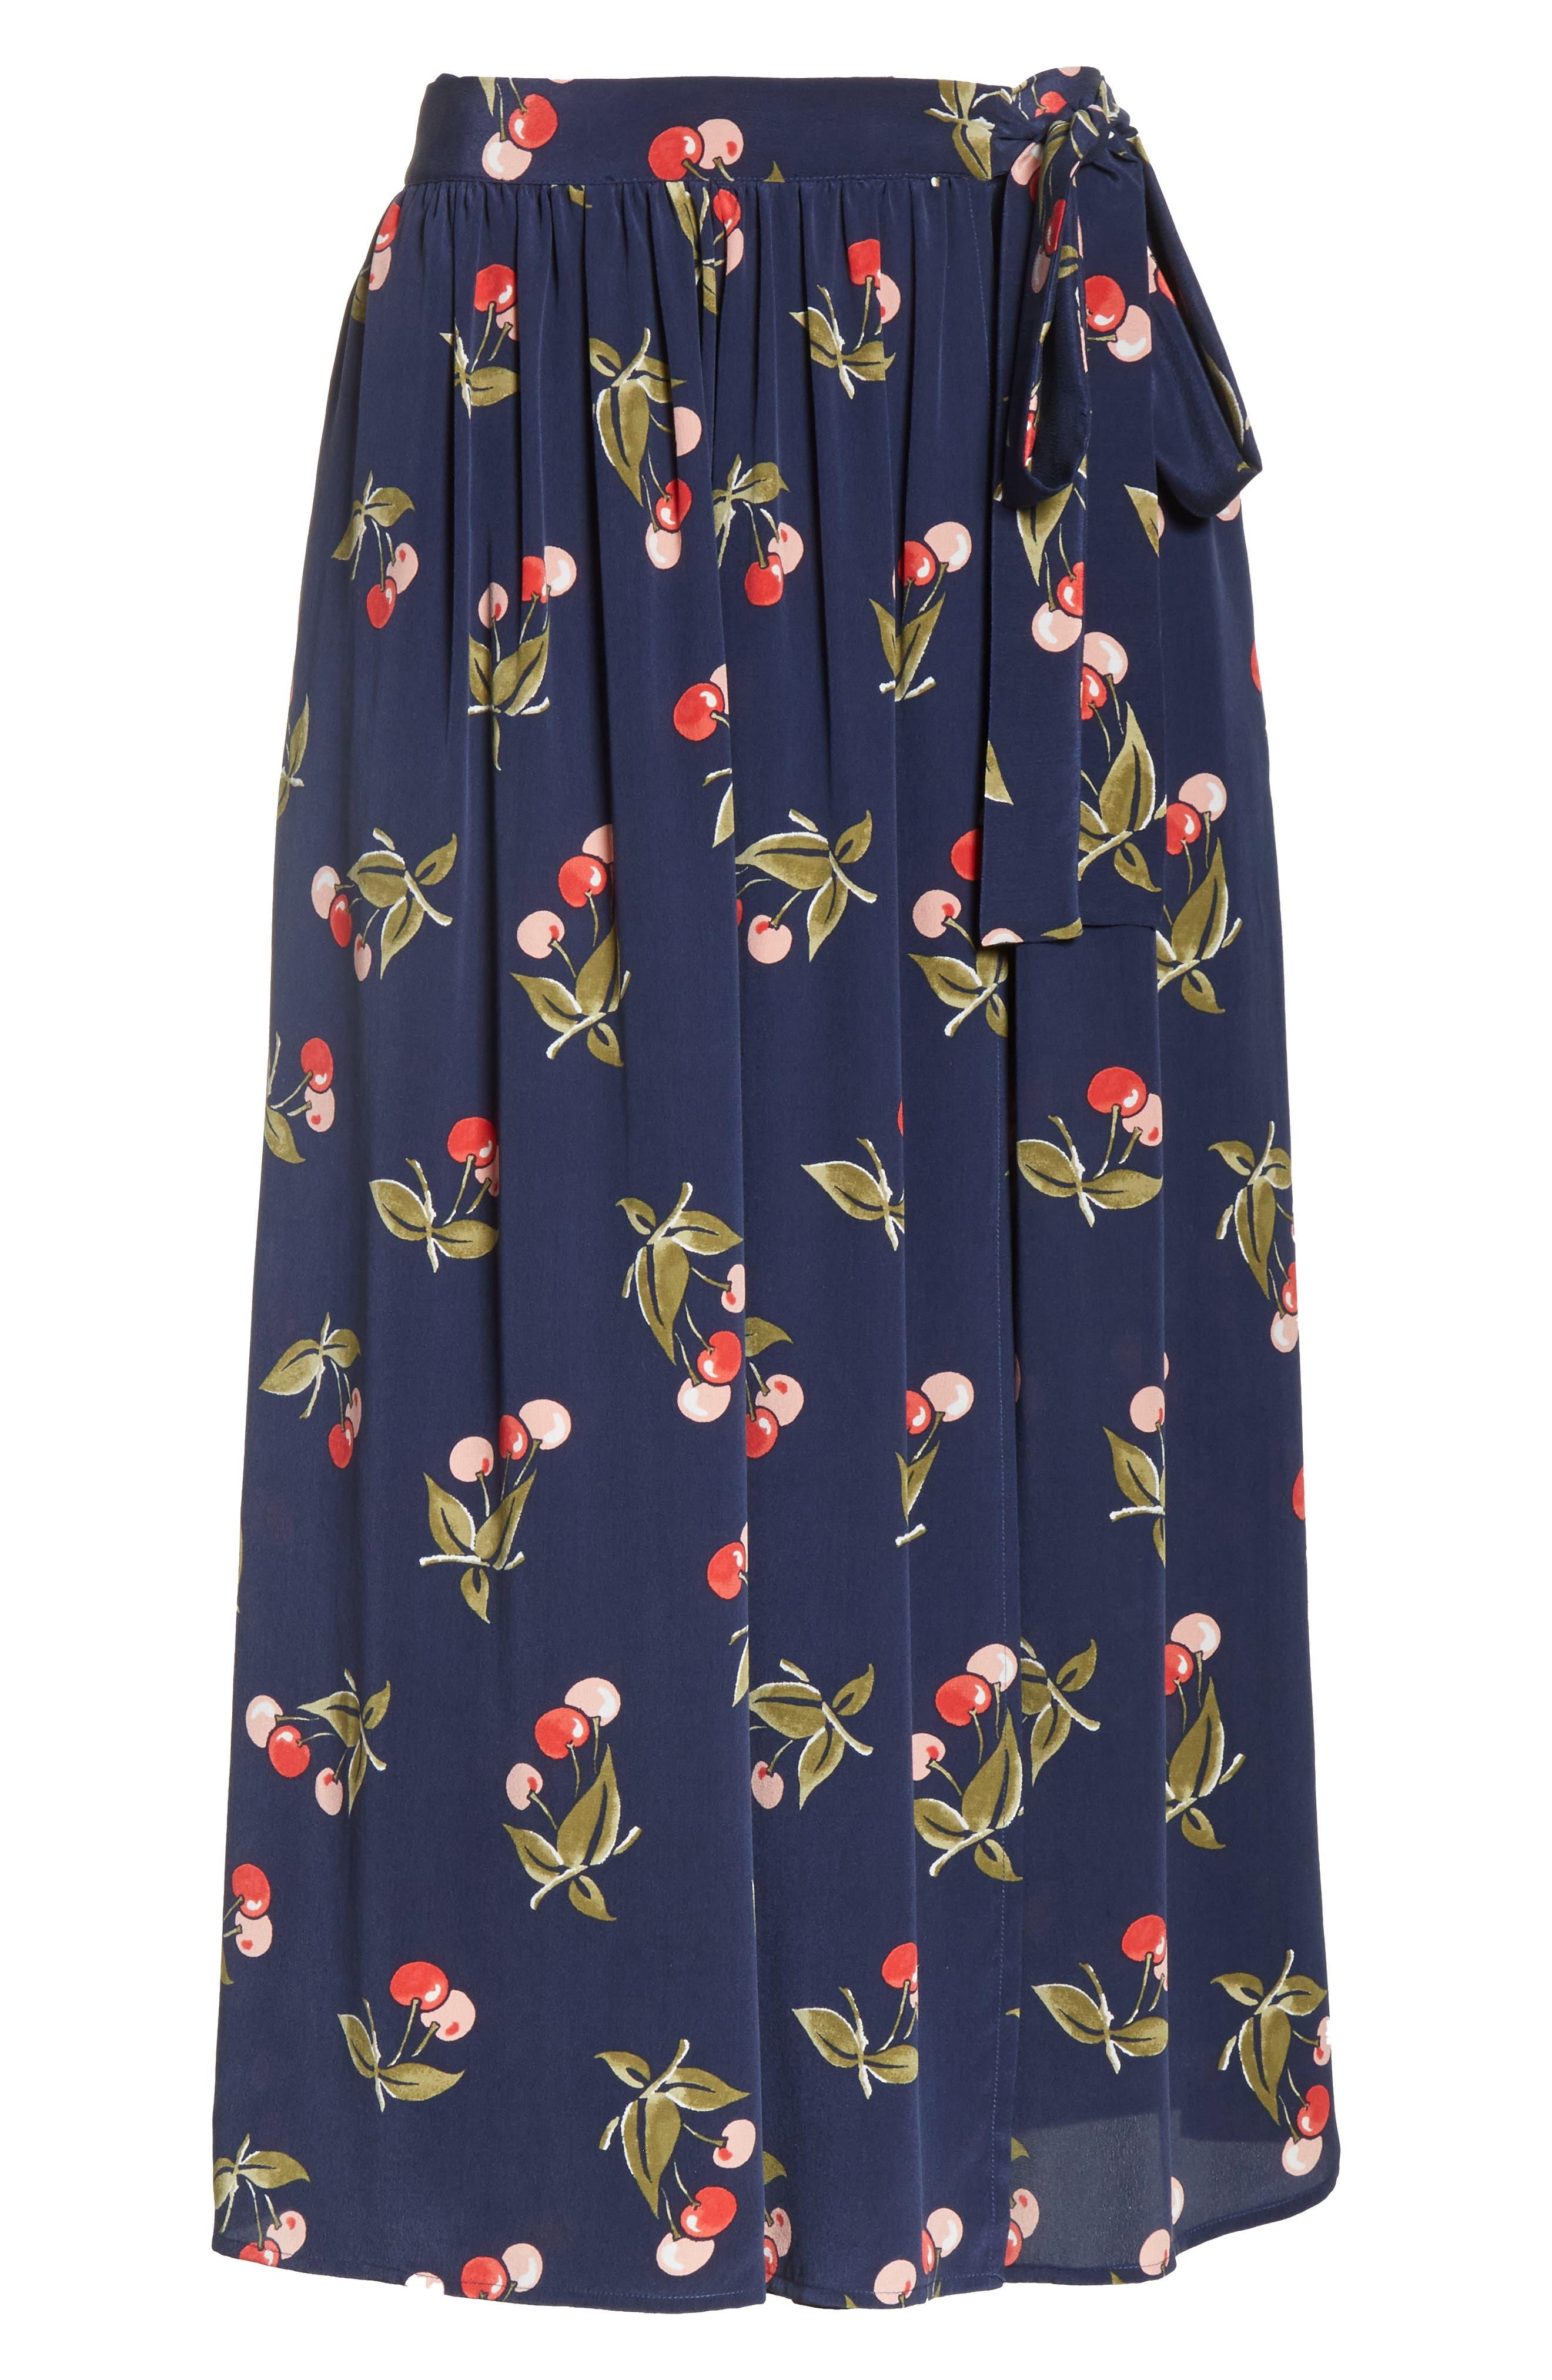 Almudena Cherry Print Silk Wrap Skirt,                             Alternate thumbnail 6, color,                             402